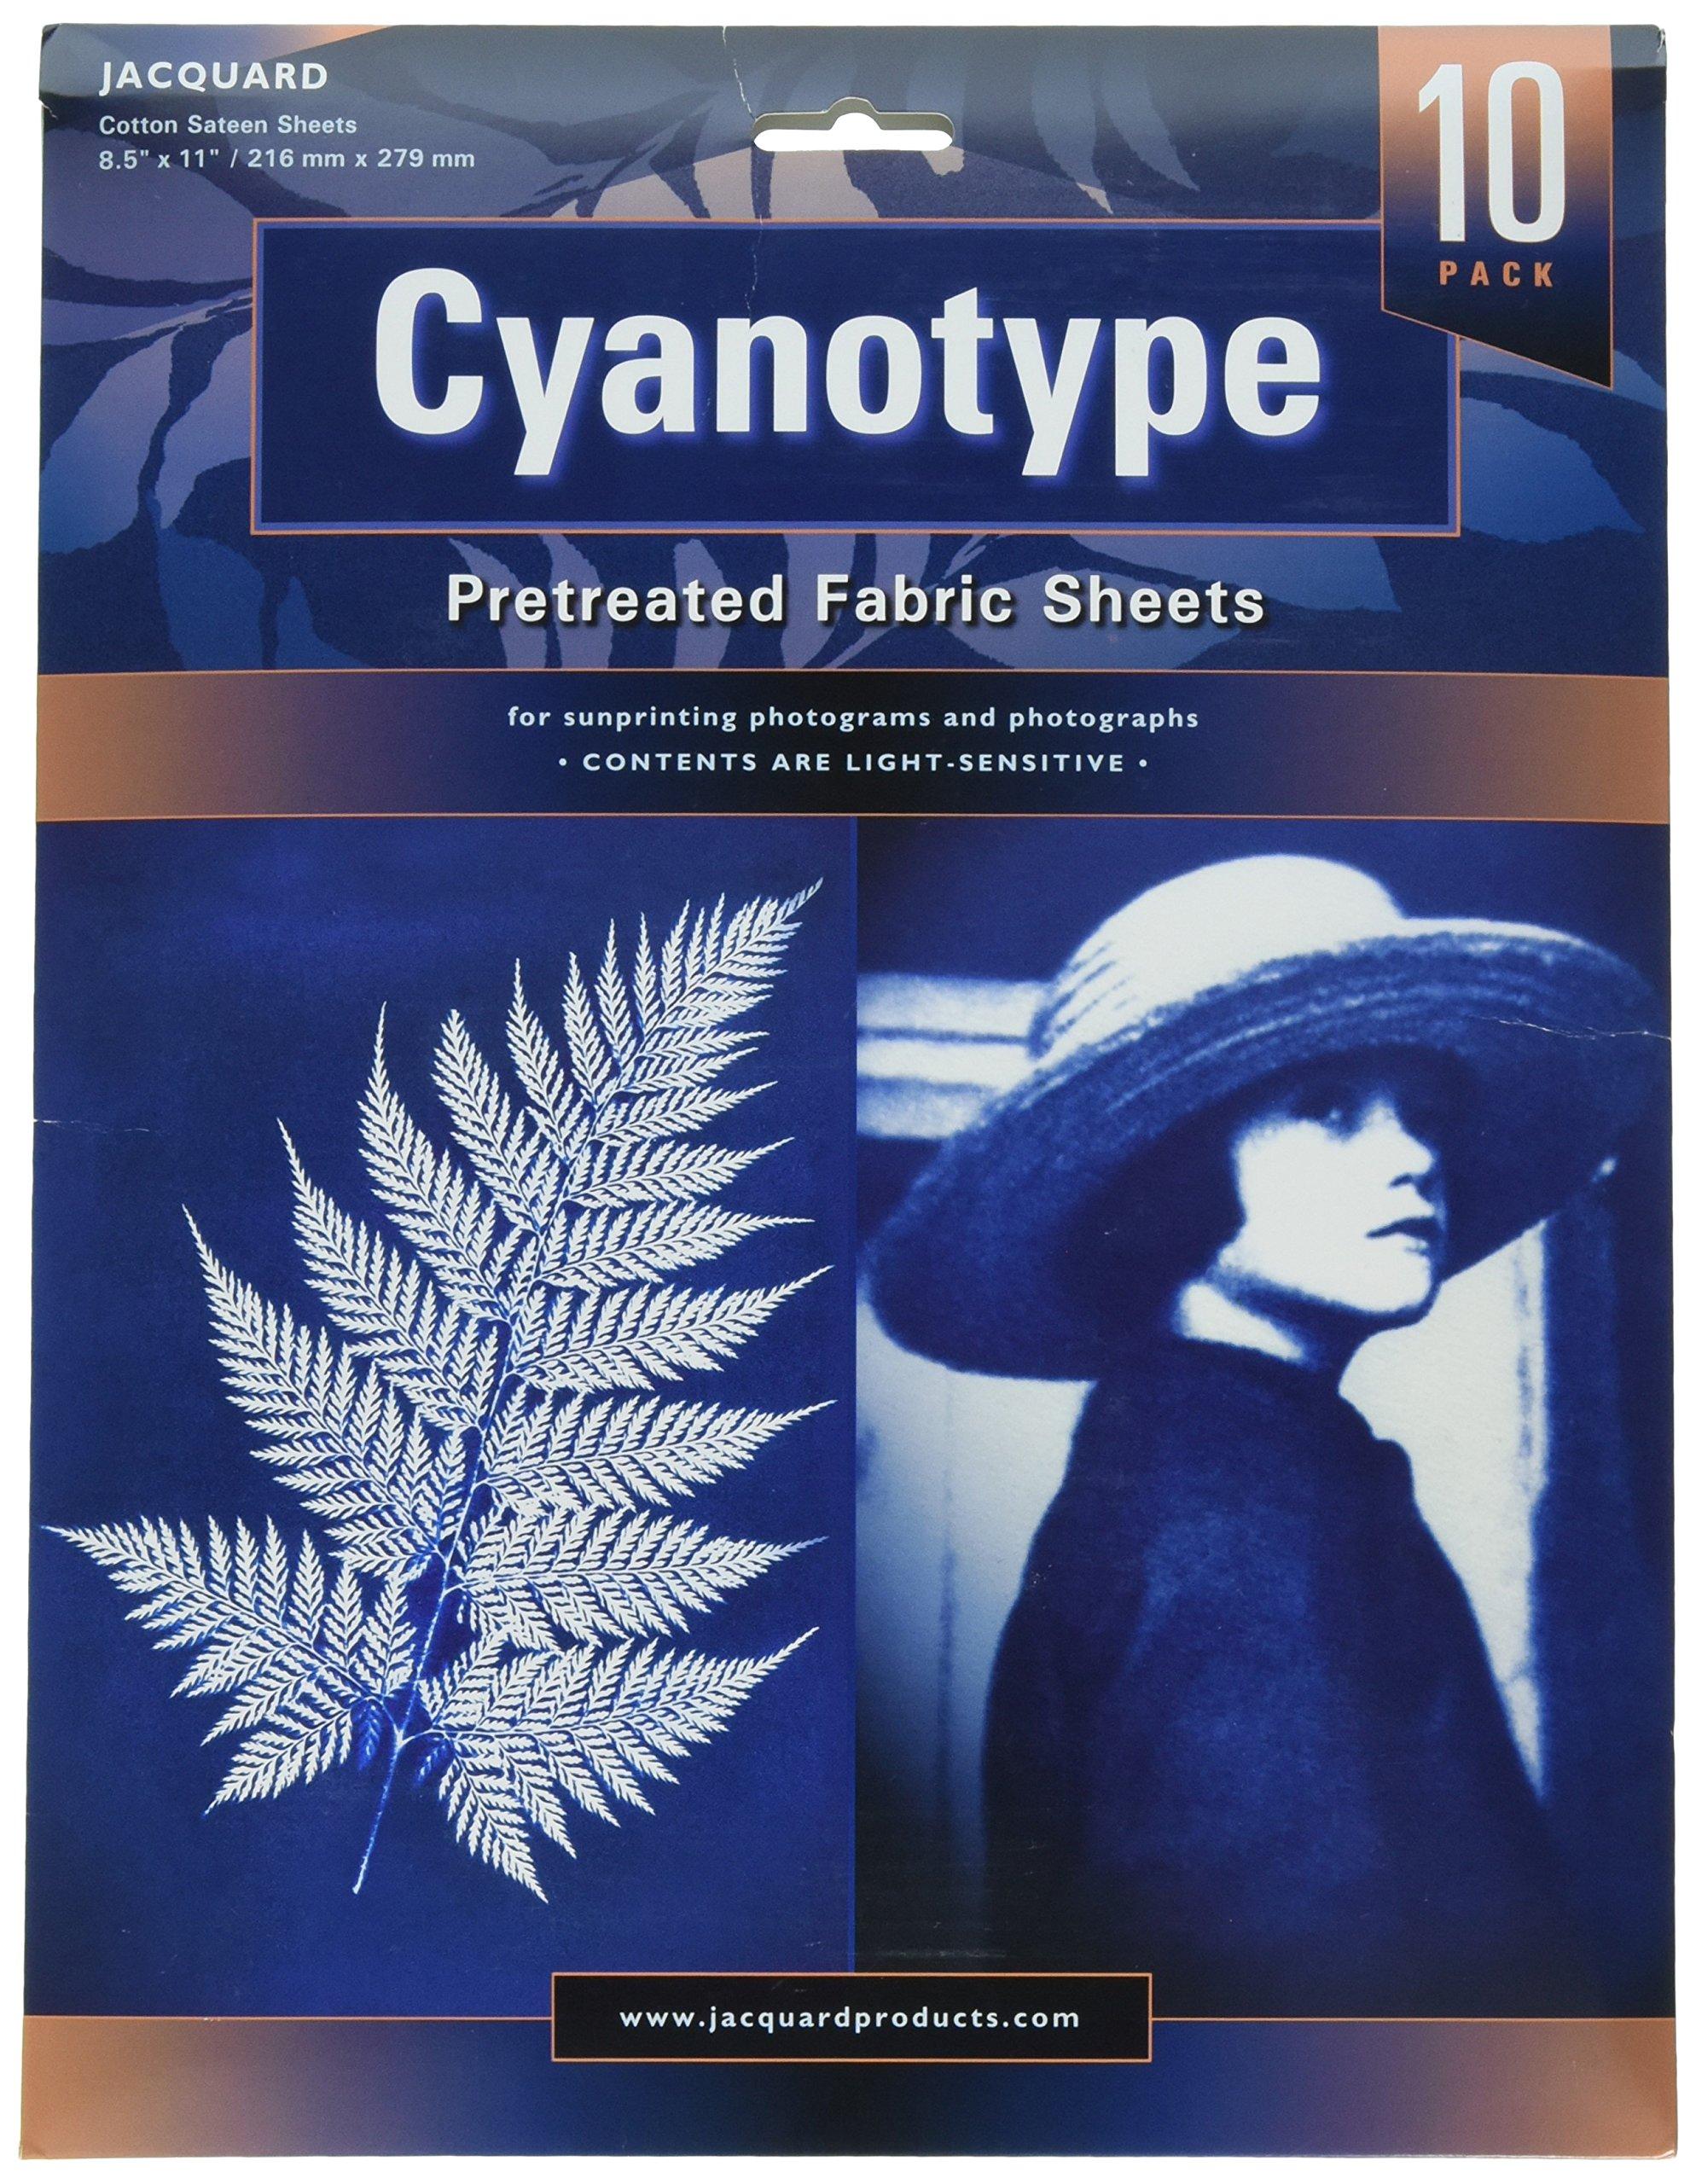 Jacquard Cyanotype Pretreat Fabric Sheets 10-Pack 8.5'' x 11''